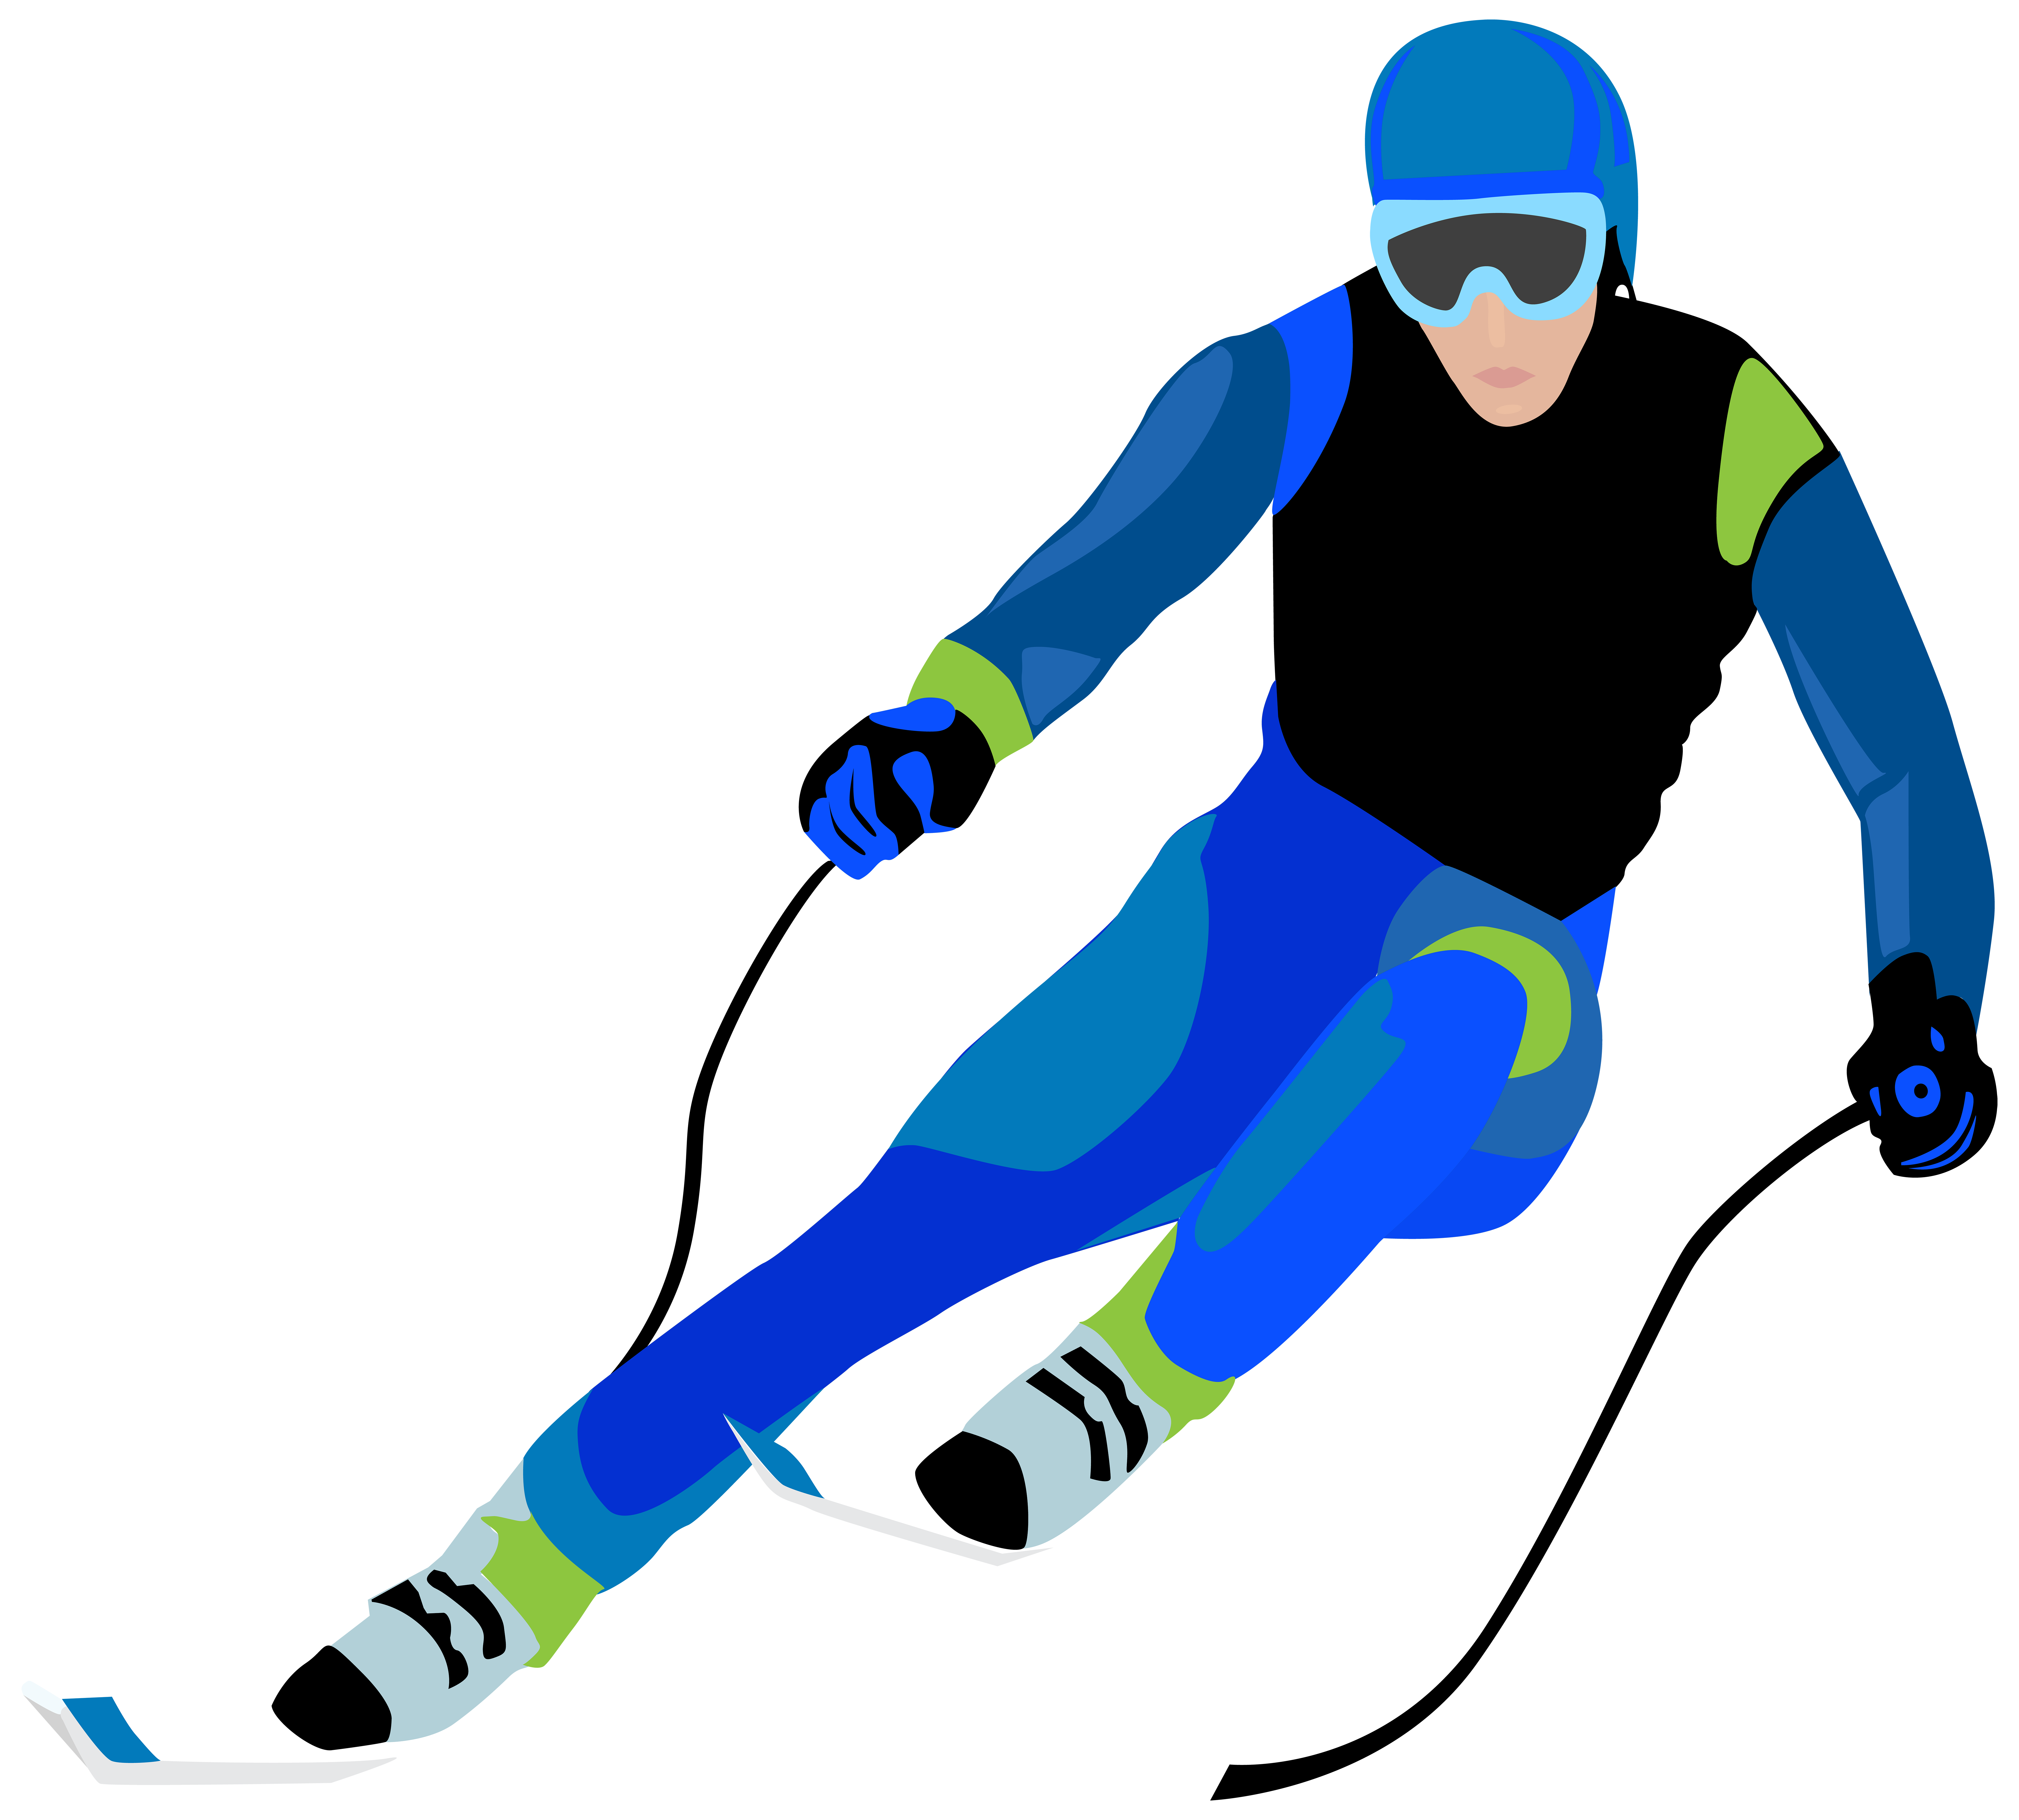 Skier Clip Art Image.